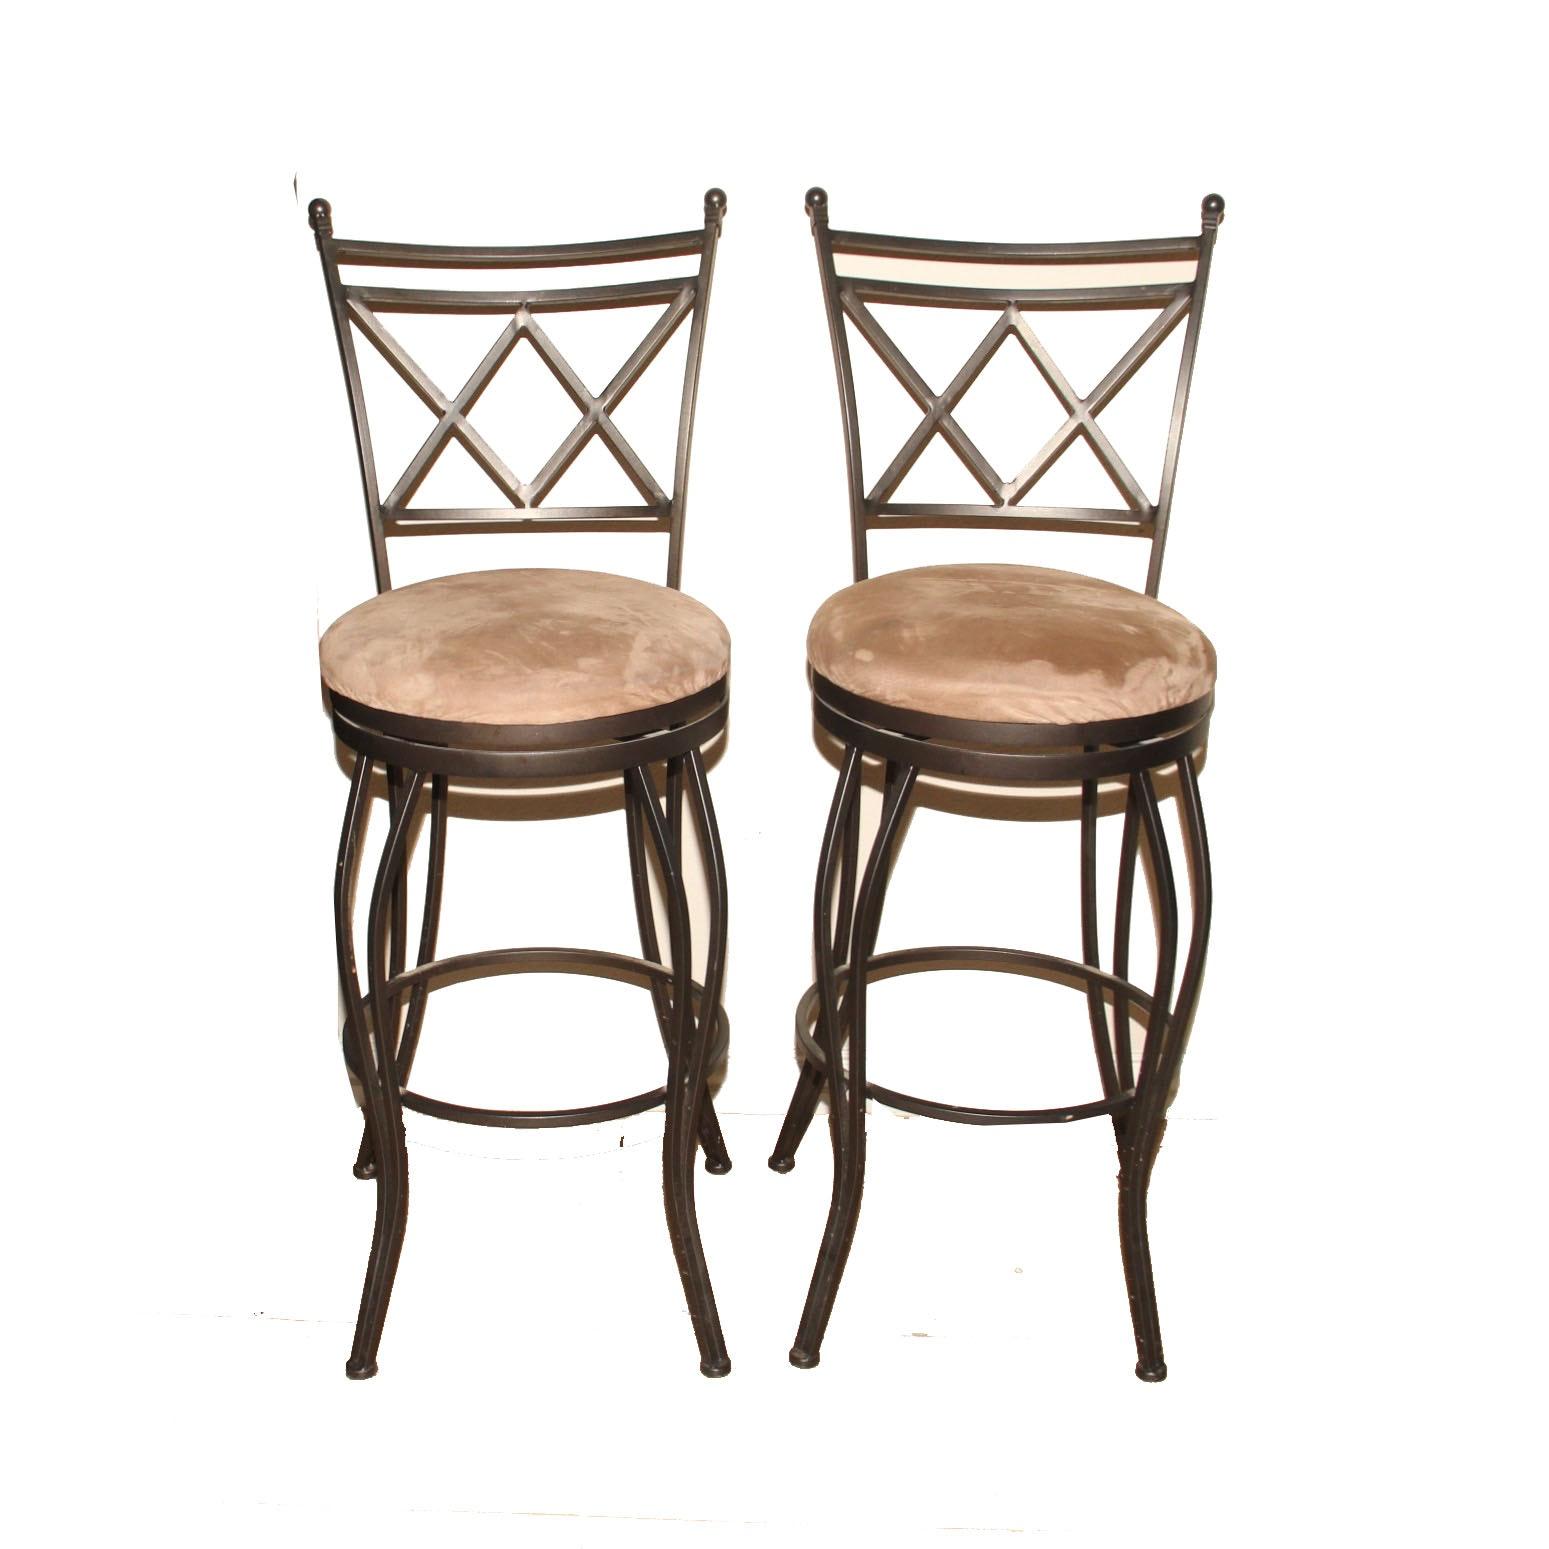 Cheyenne Home Furnishings Pair Of Wrought Iron Bar Stools